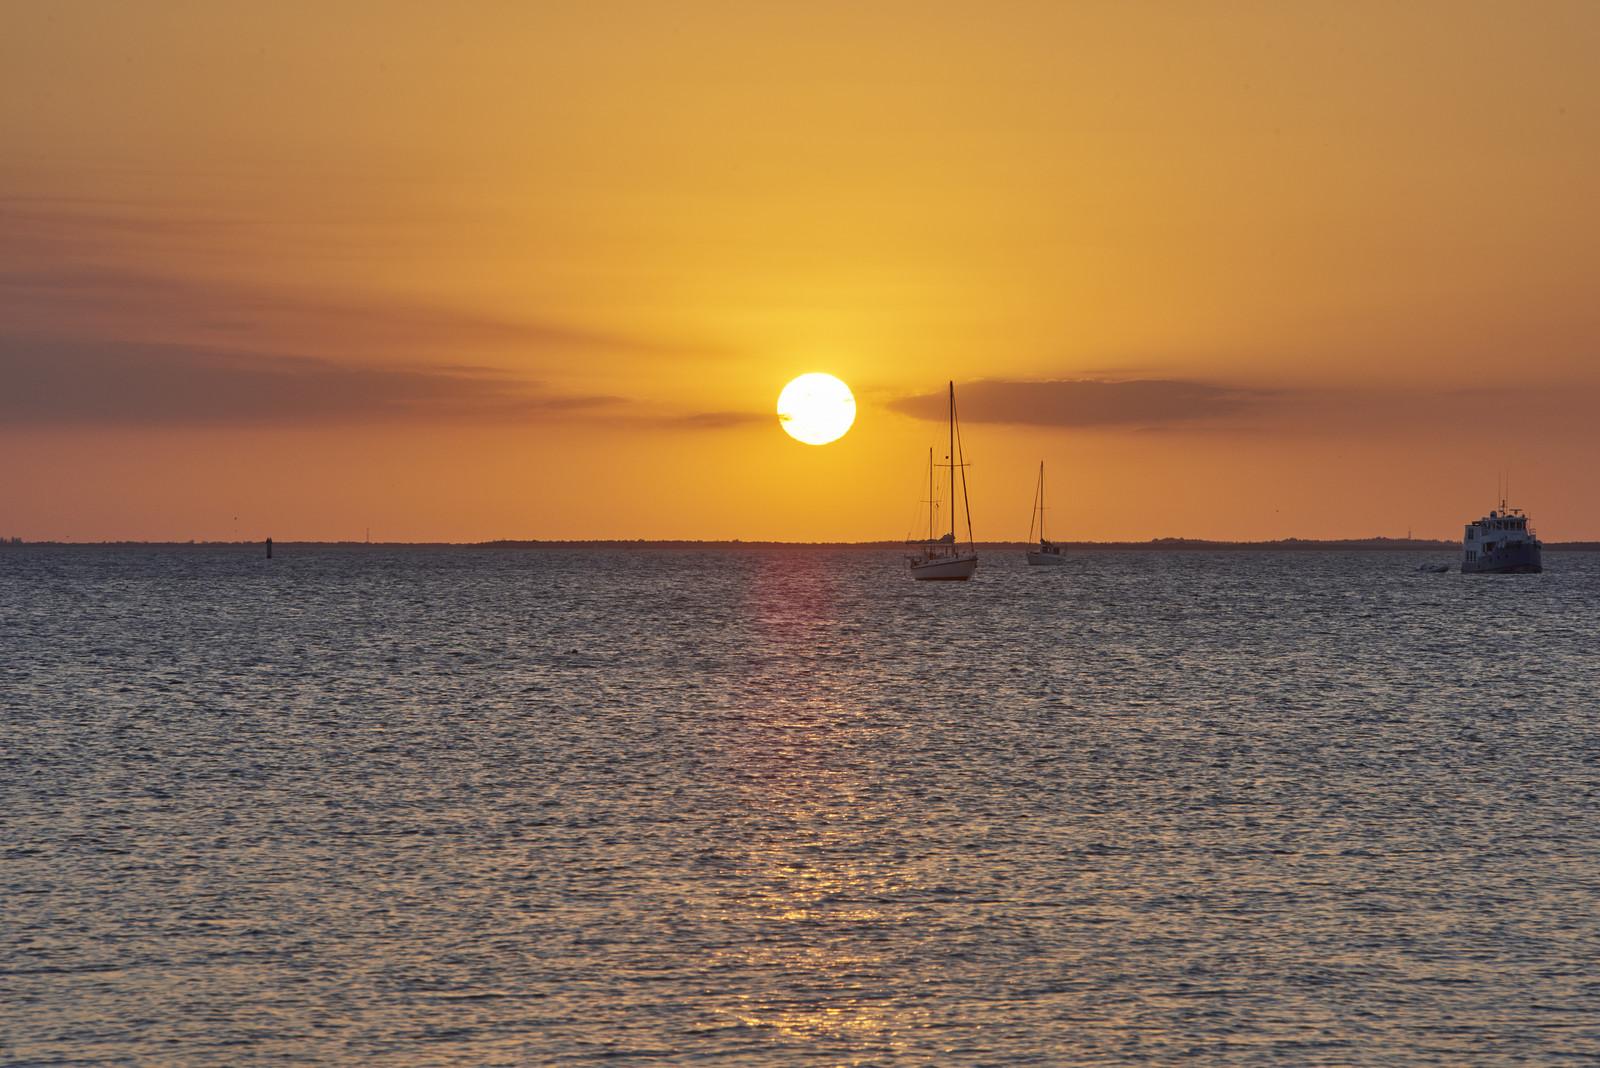 Golden Sunset over Punta Gorda coastal area with three boats floating on the horizon